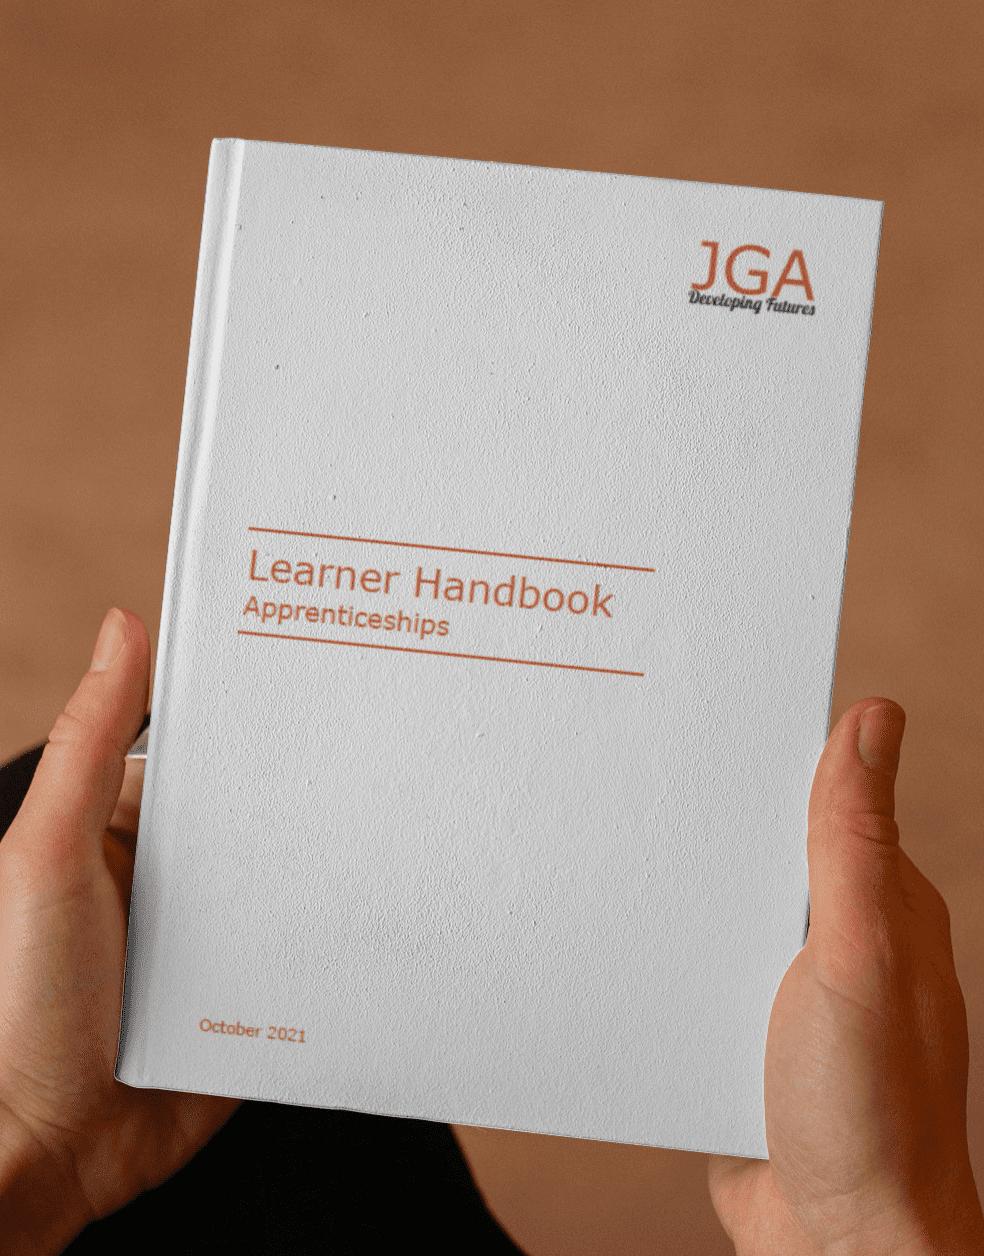 Learner handbook cover